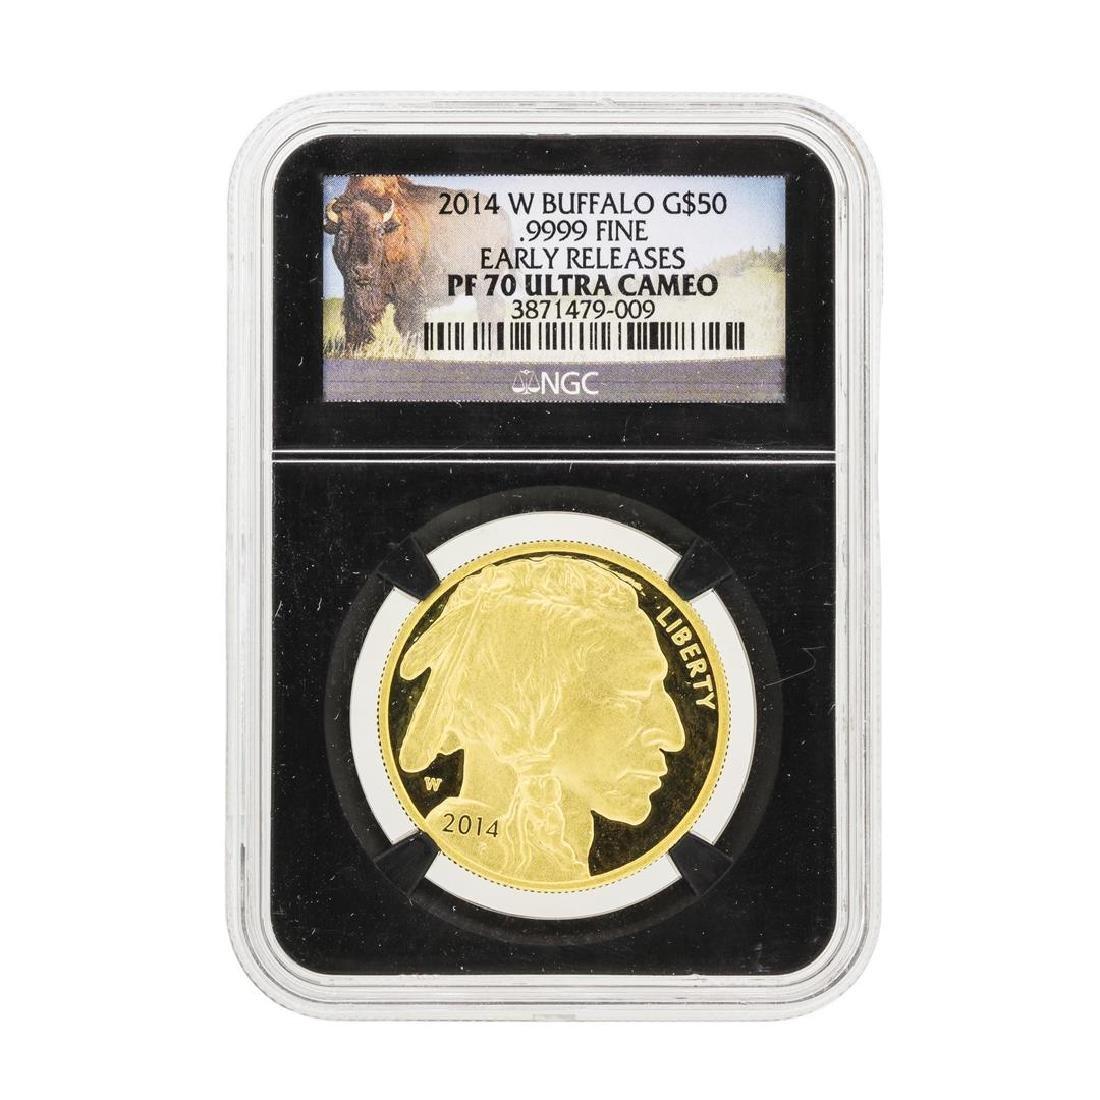 2014-W $50 American Buffalo Gold Coin NGC PS70 Ultra